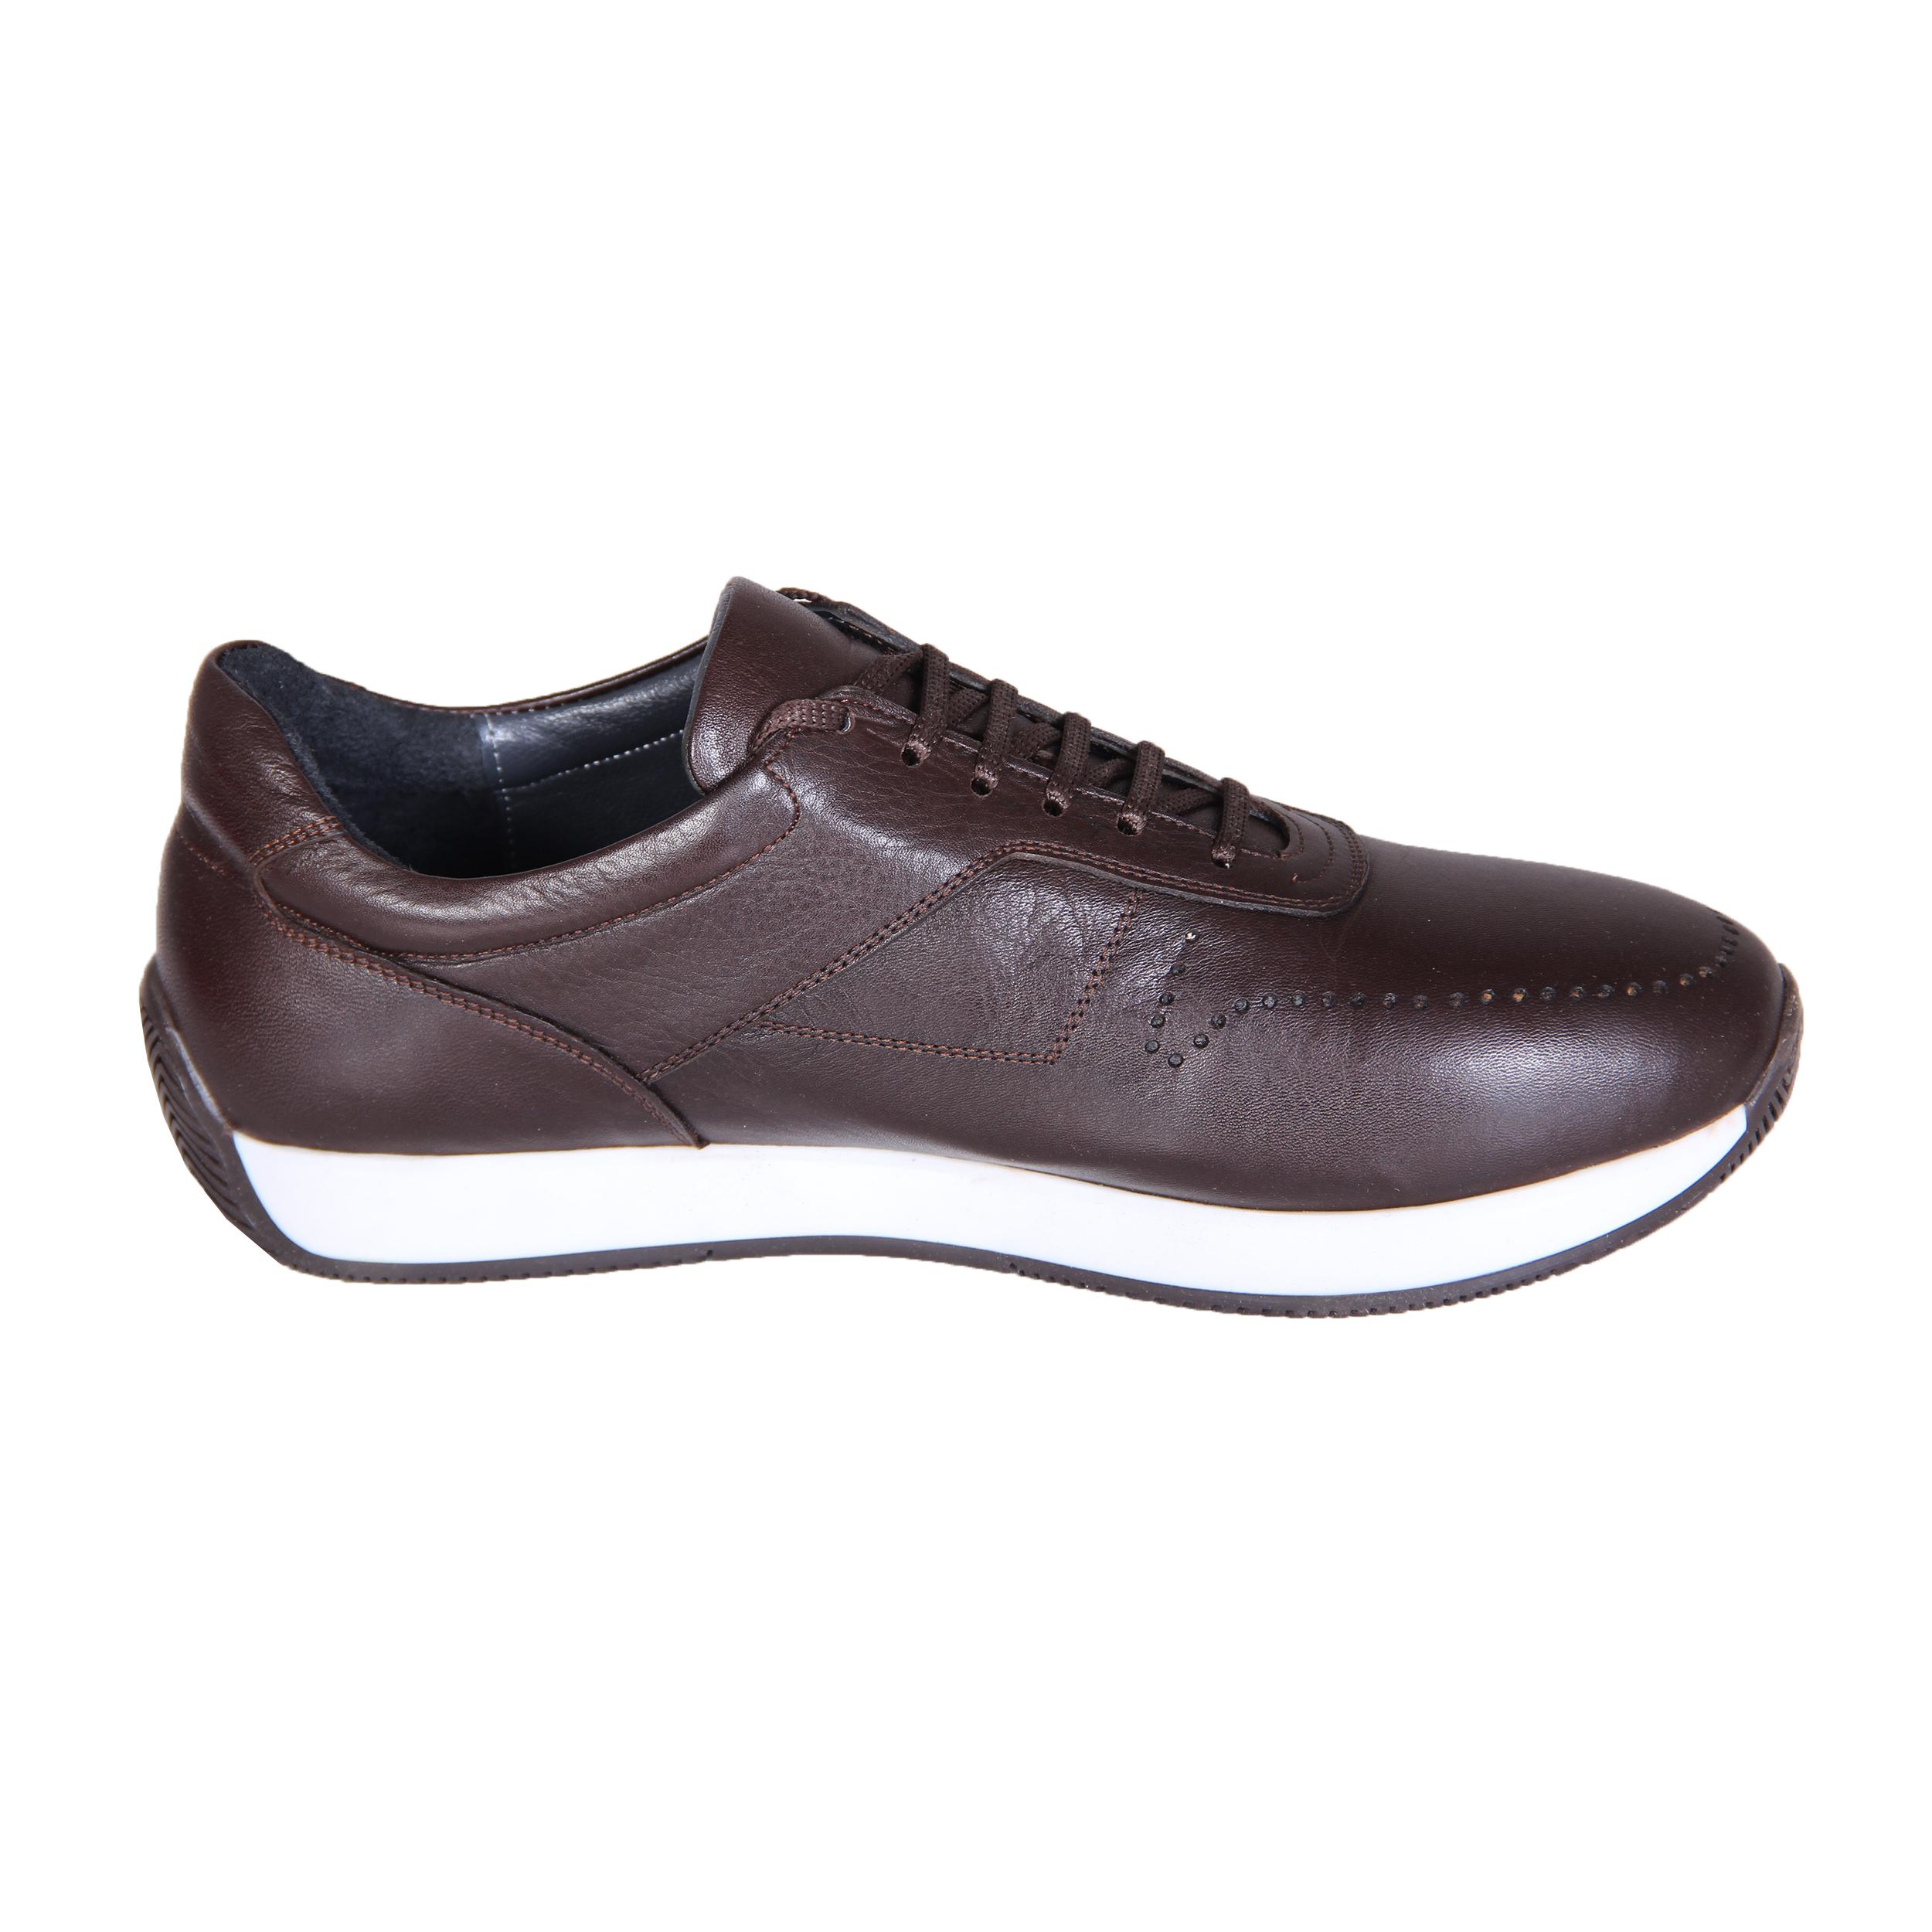 SHAHRECHARM men's casual shoes ,GH5003-3 Model